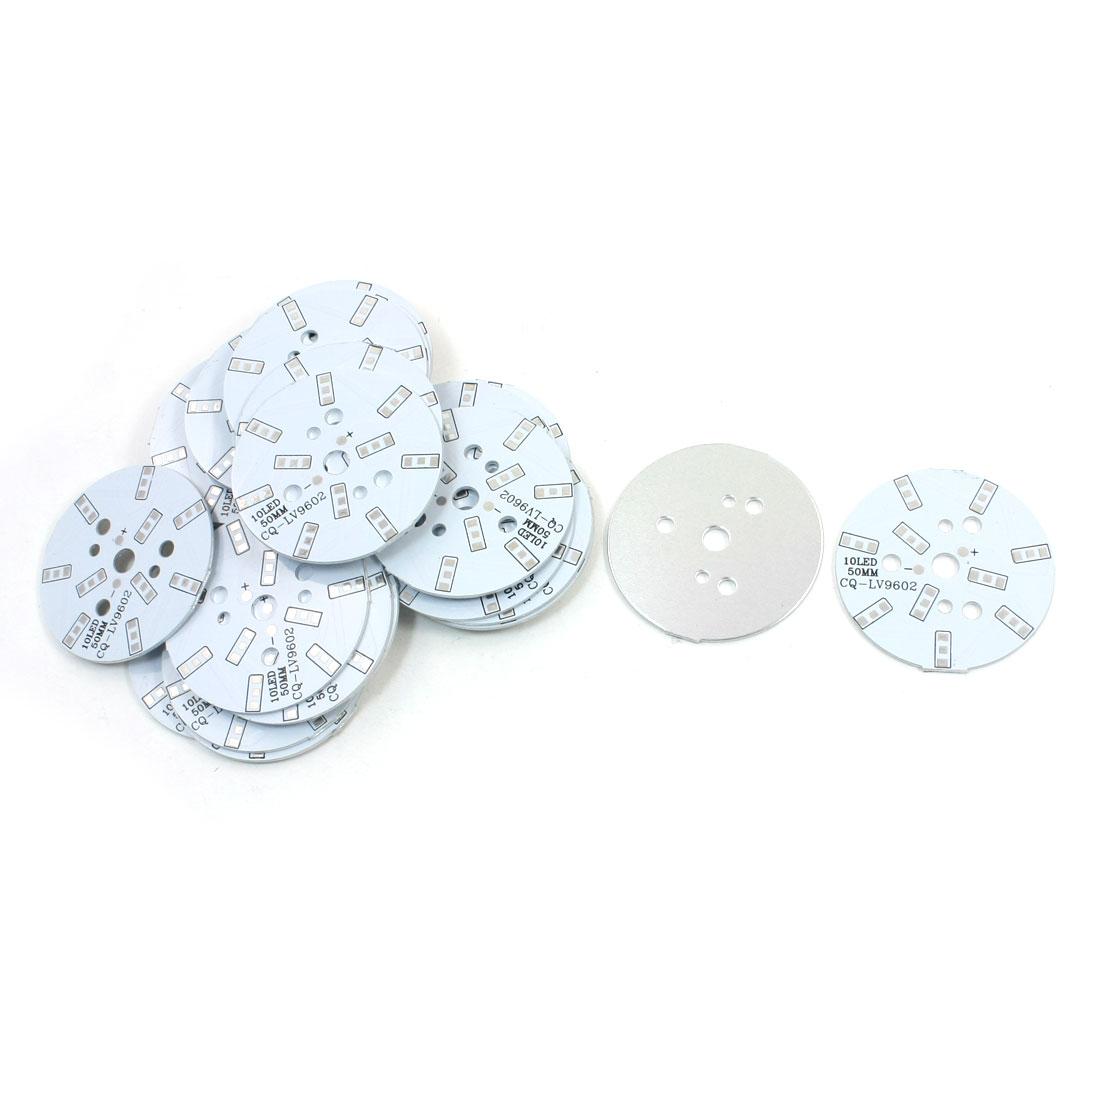 30Pcs 10 x 1/2W 5730 SMD LED High Power DIY Circle Aluminum PCB Circuit Board 50mm Diameter